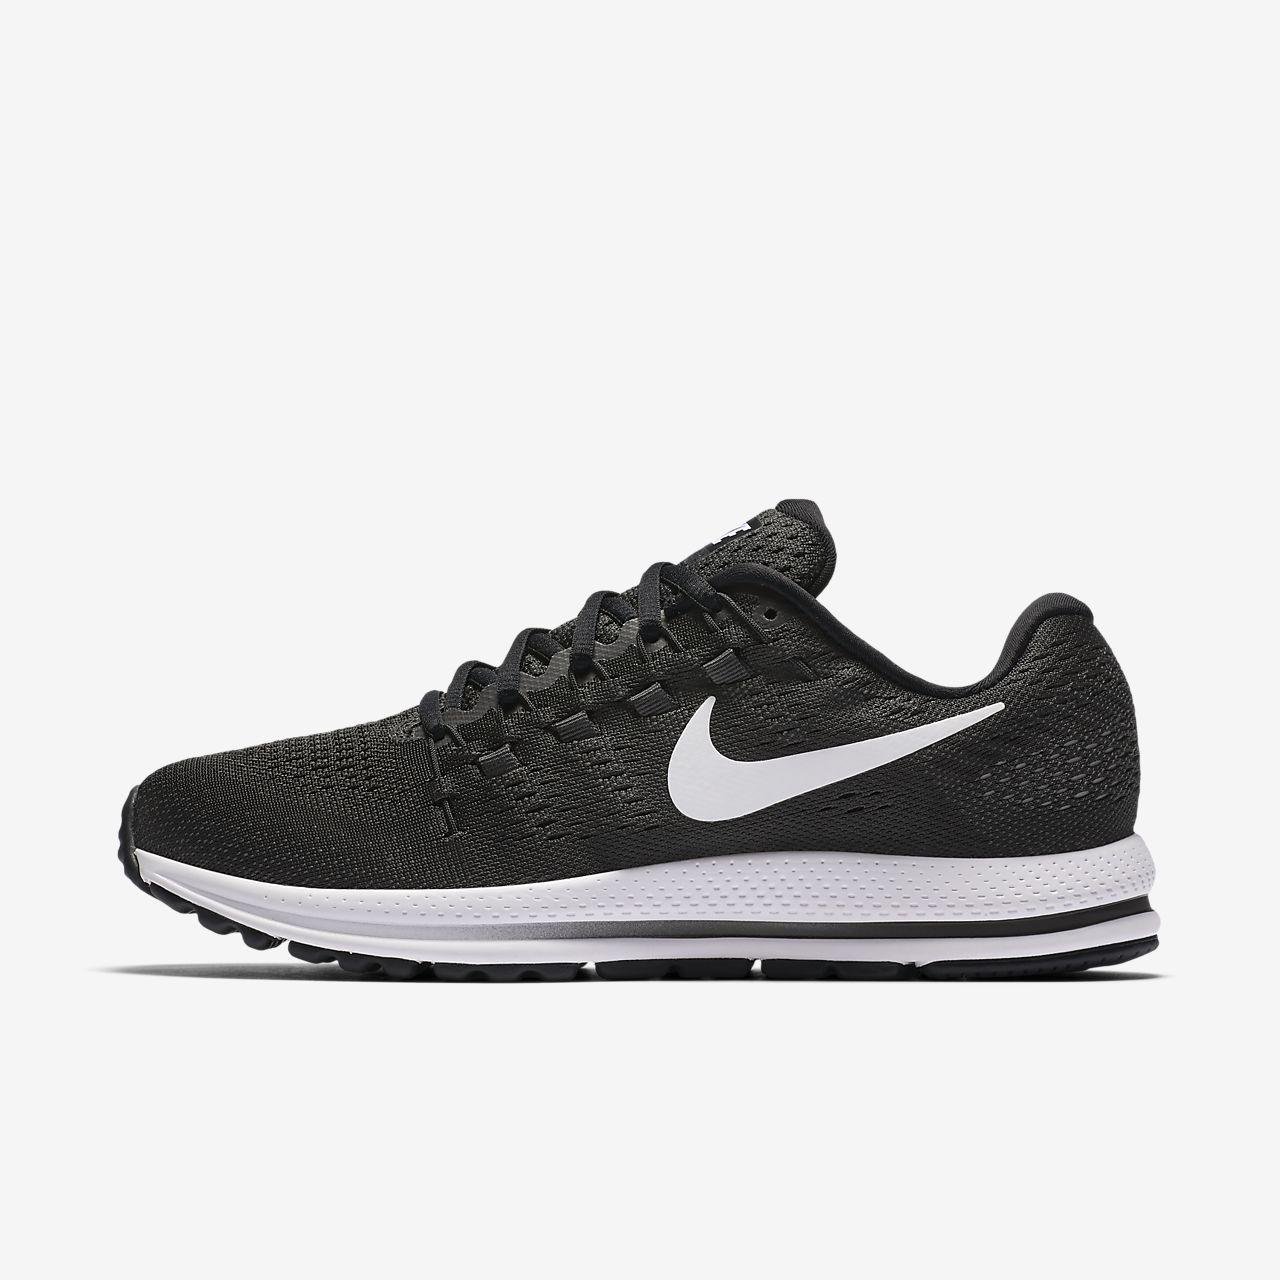 Nike Free Run 2 Noir / Blanc / Anthracite / Gris Nike Zoom Vamero 11